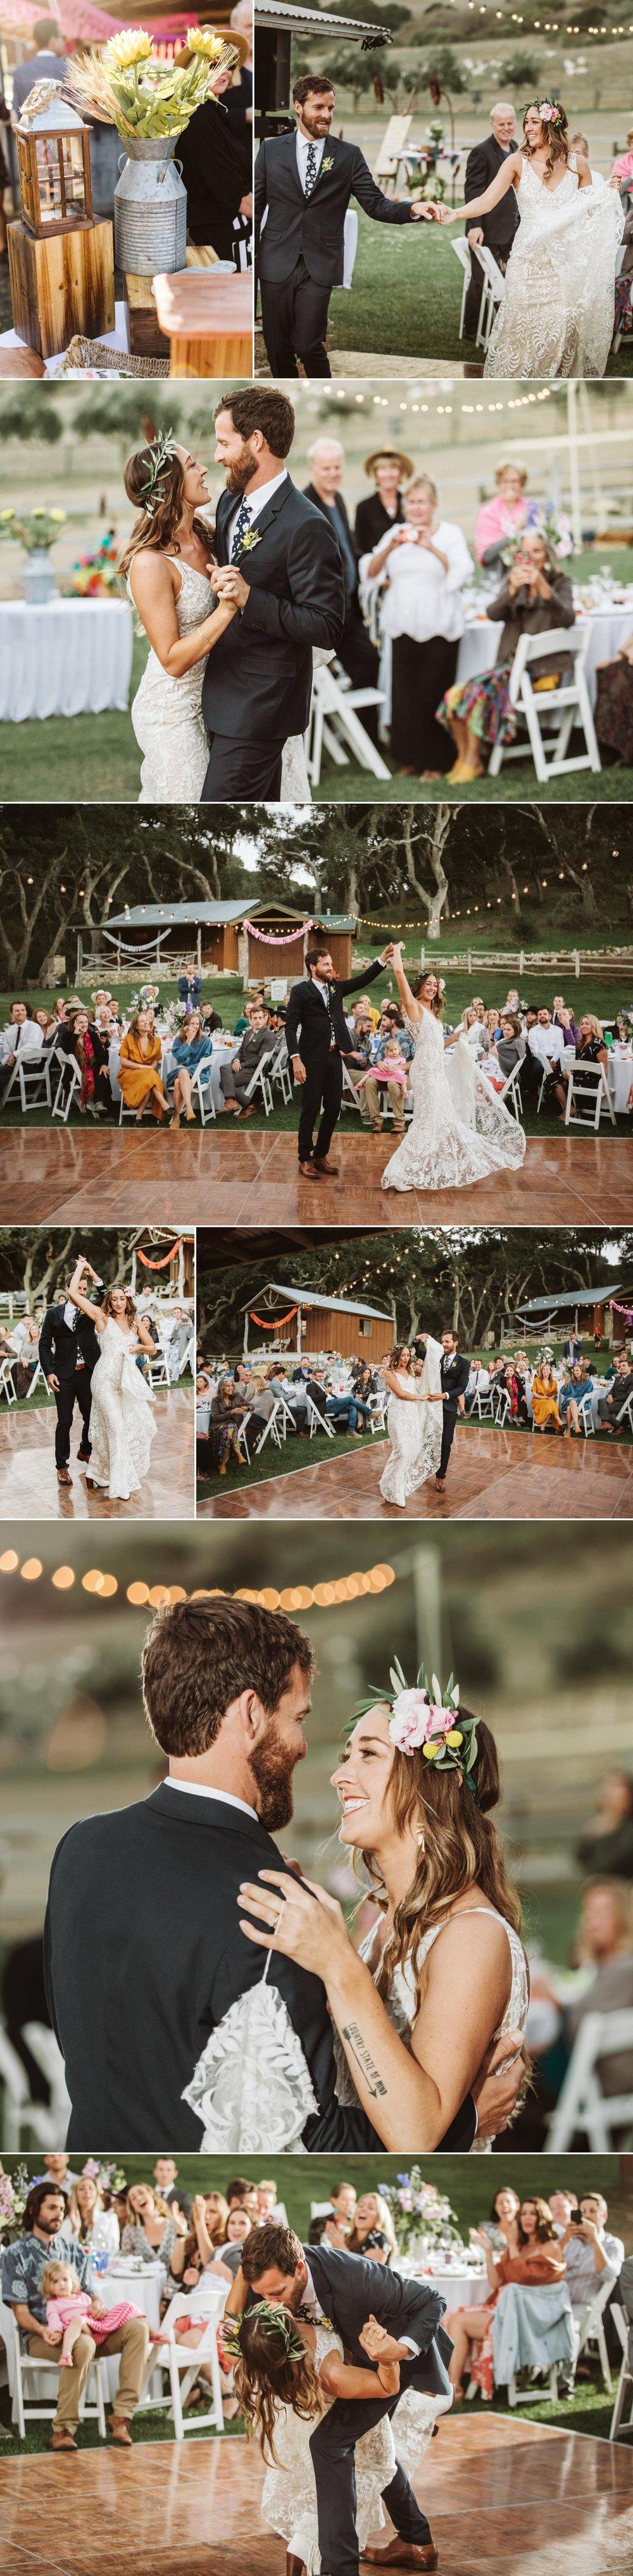 Colorful Barn Wedding at Jalama Canon Ranch- Lompoc- Santa Barbara- Geoff & Lauren 27.jpg